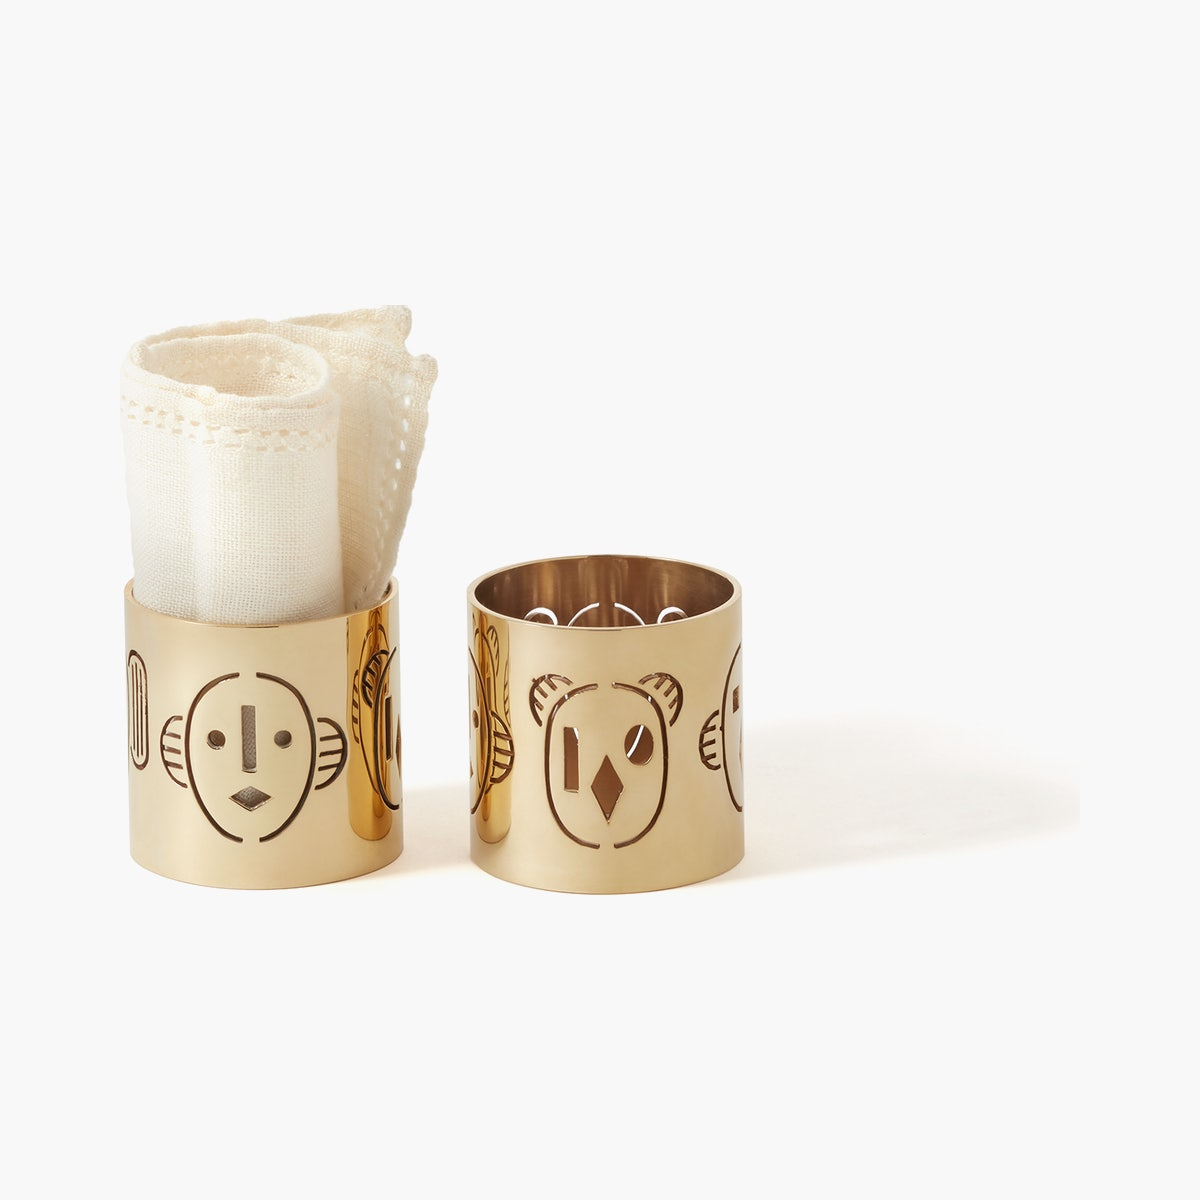 Maski Napkin Ring - set of 2